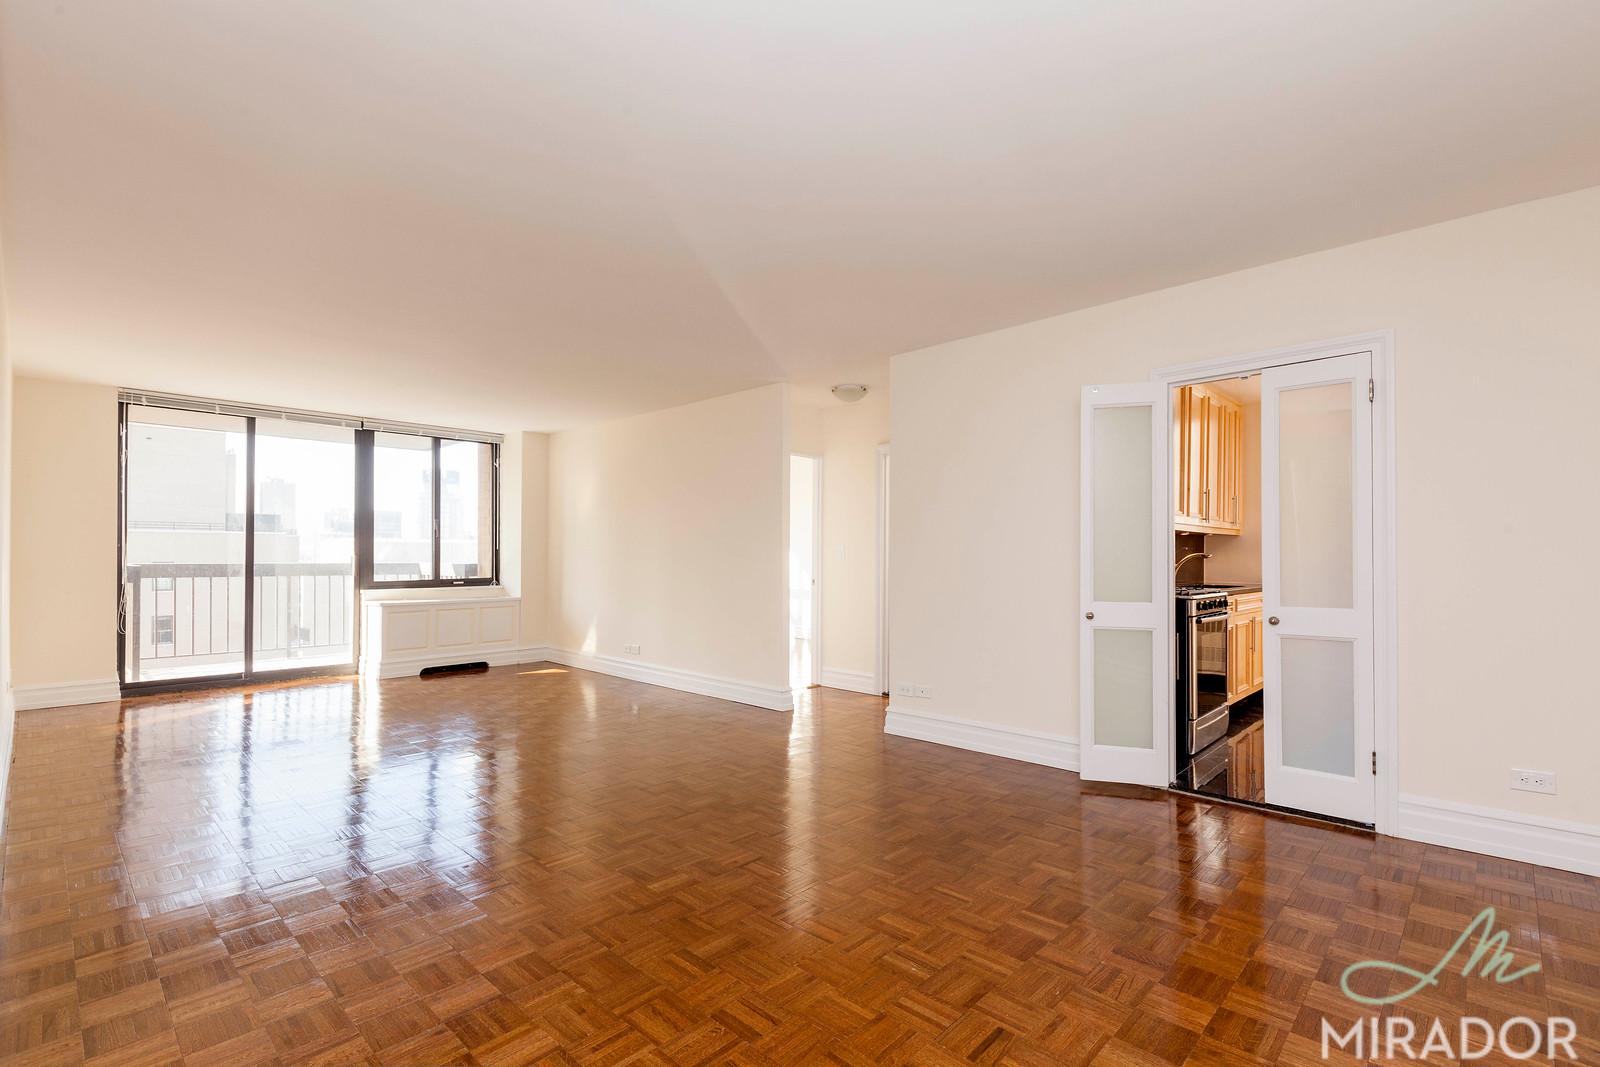 145 West 67th Street, Apt 33H, Manhattan, New York 10023